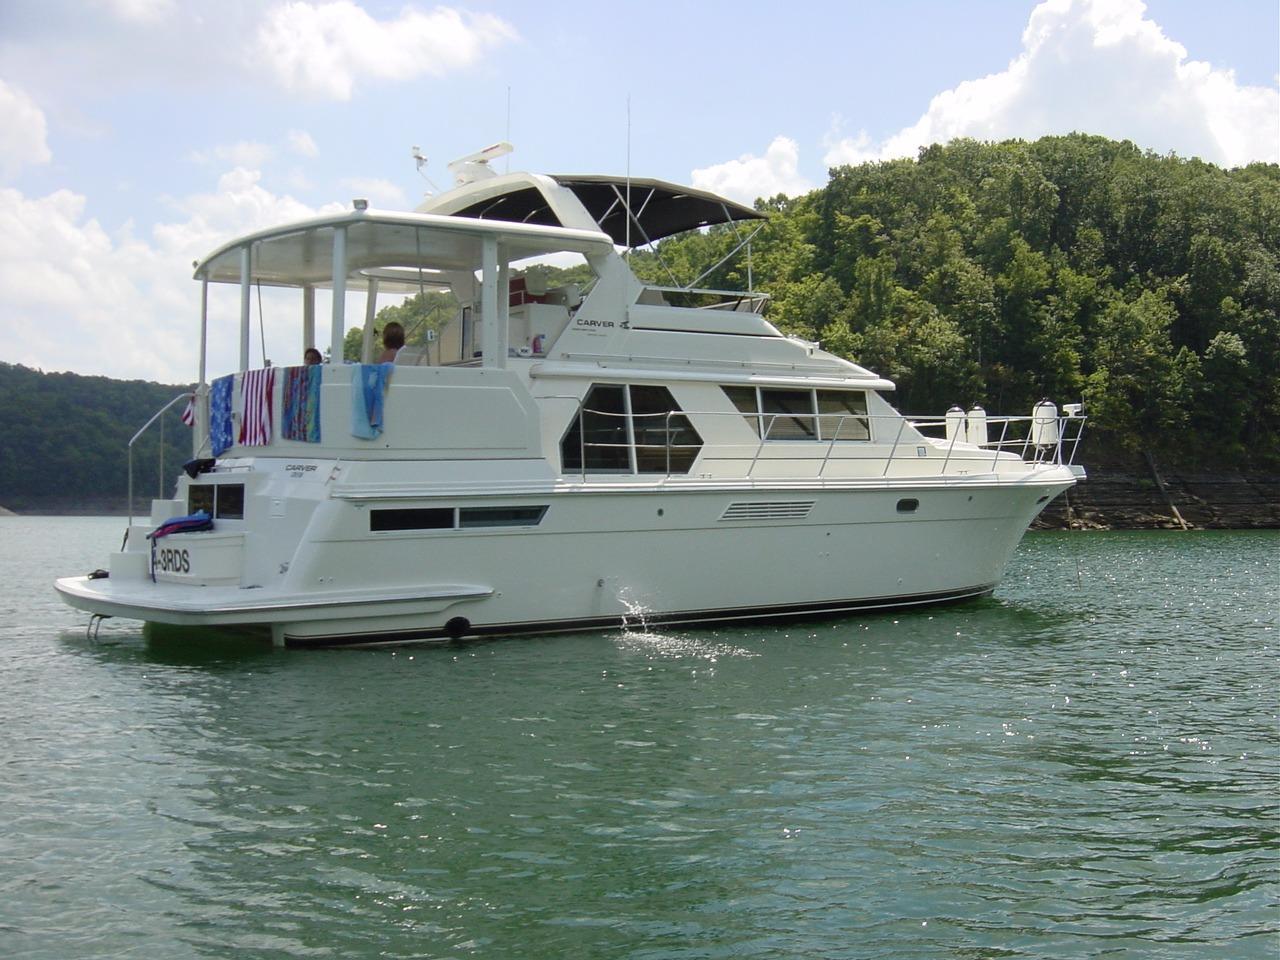 1998 Used Carver 445 Aft Cabin Motor Yacht Aft Cabin Boat